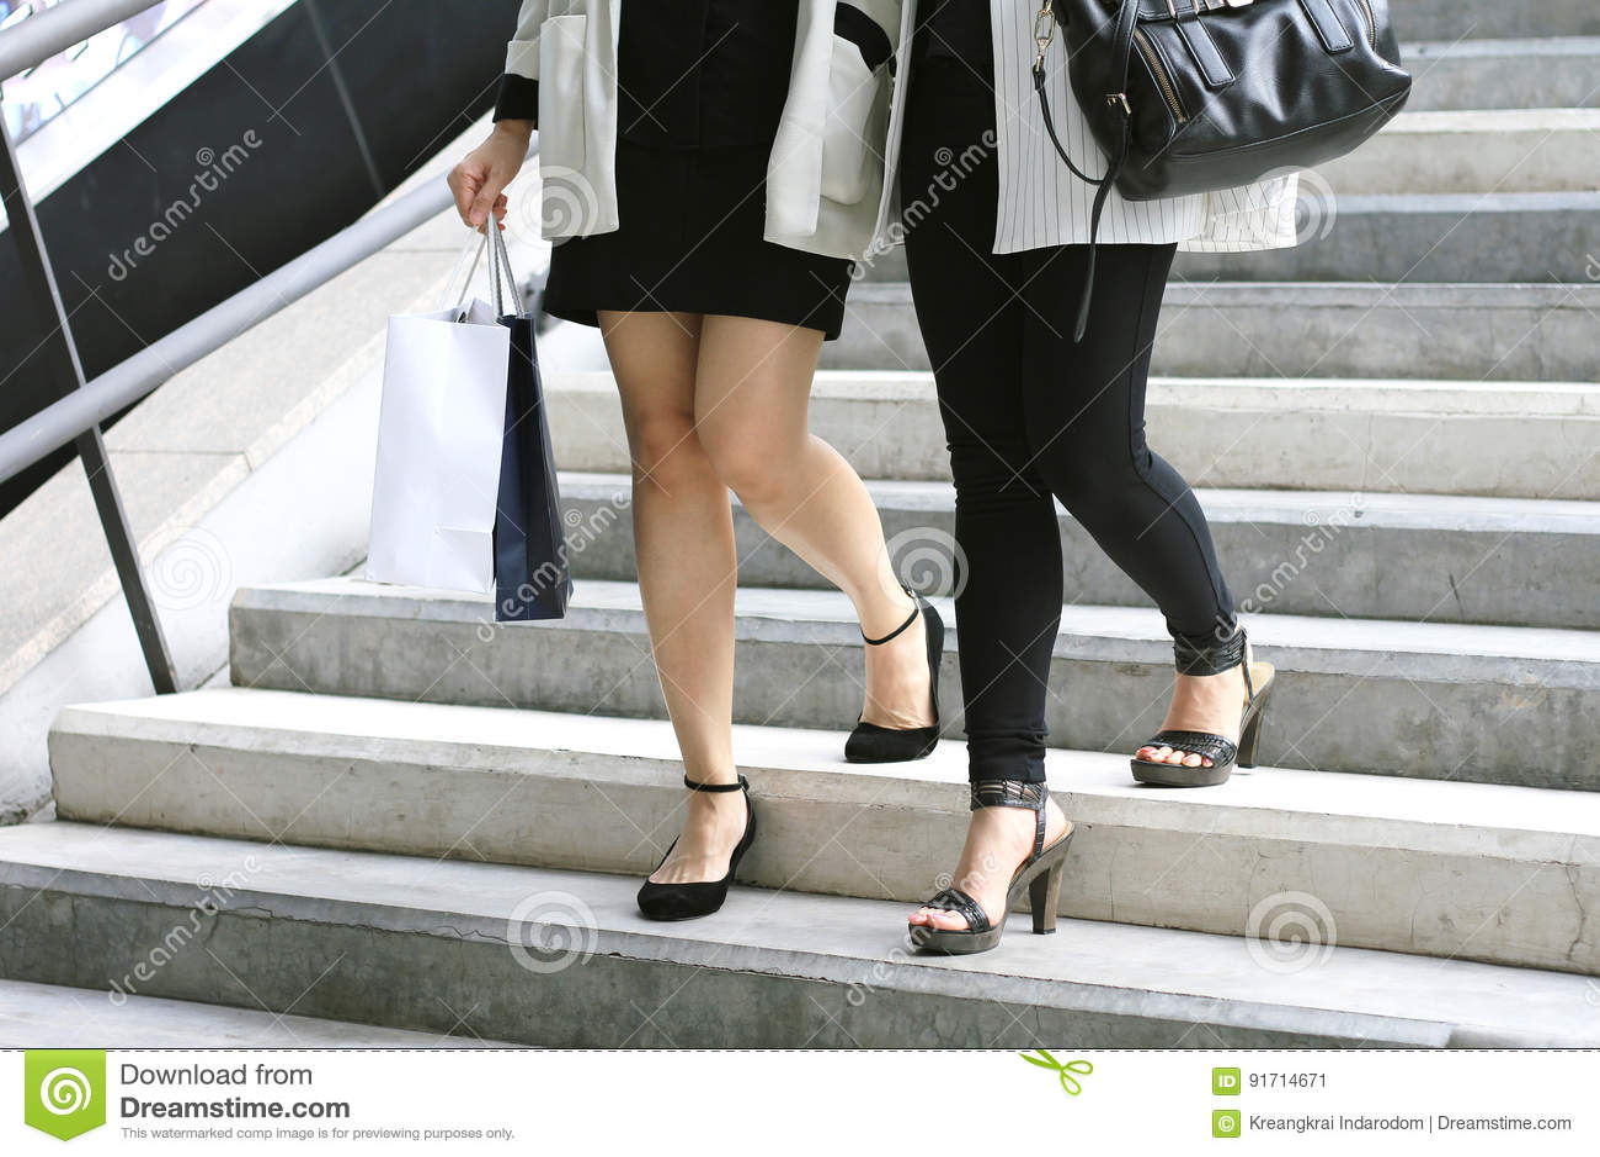 Shopping lover, Women holding shopping bags on the street.